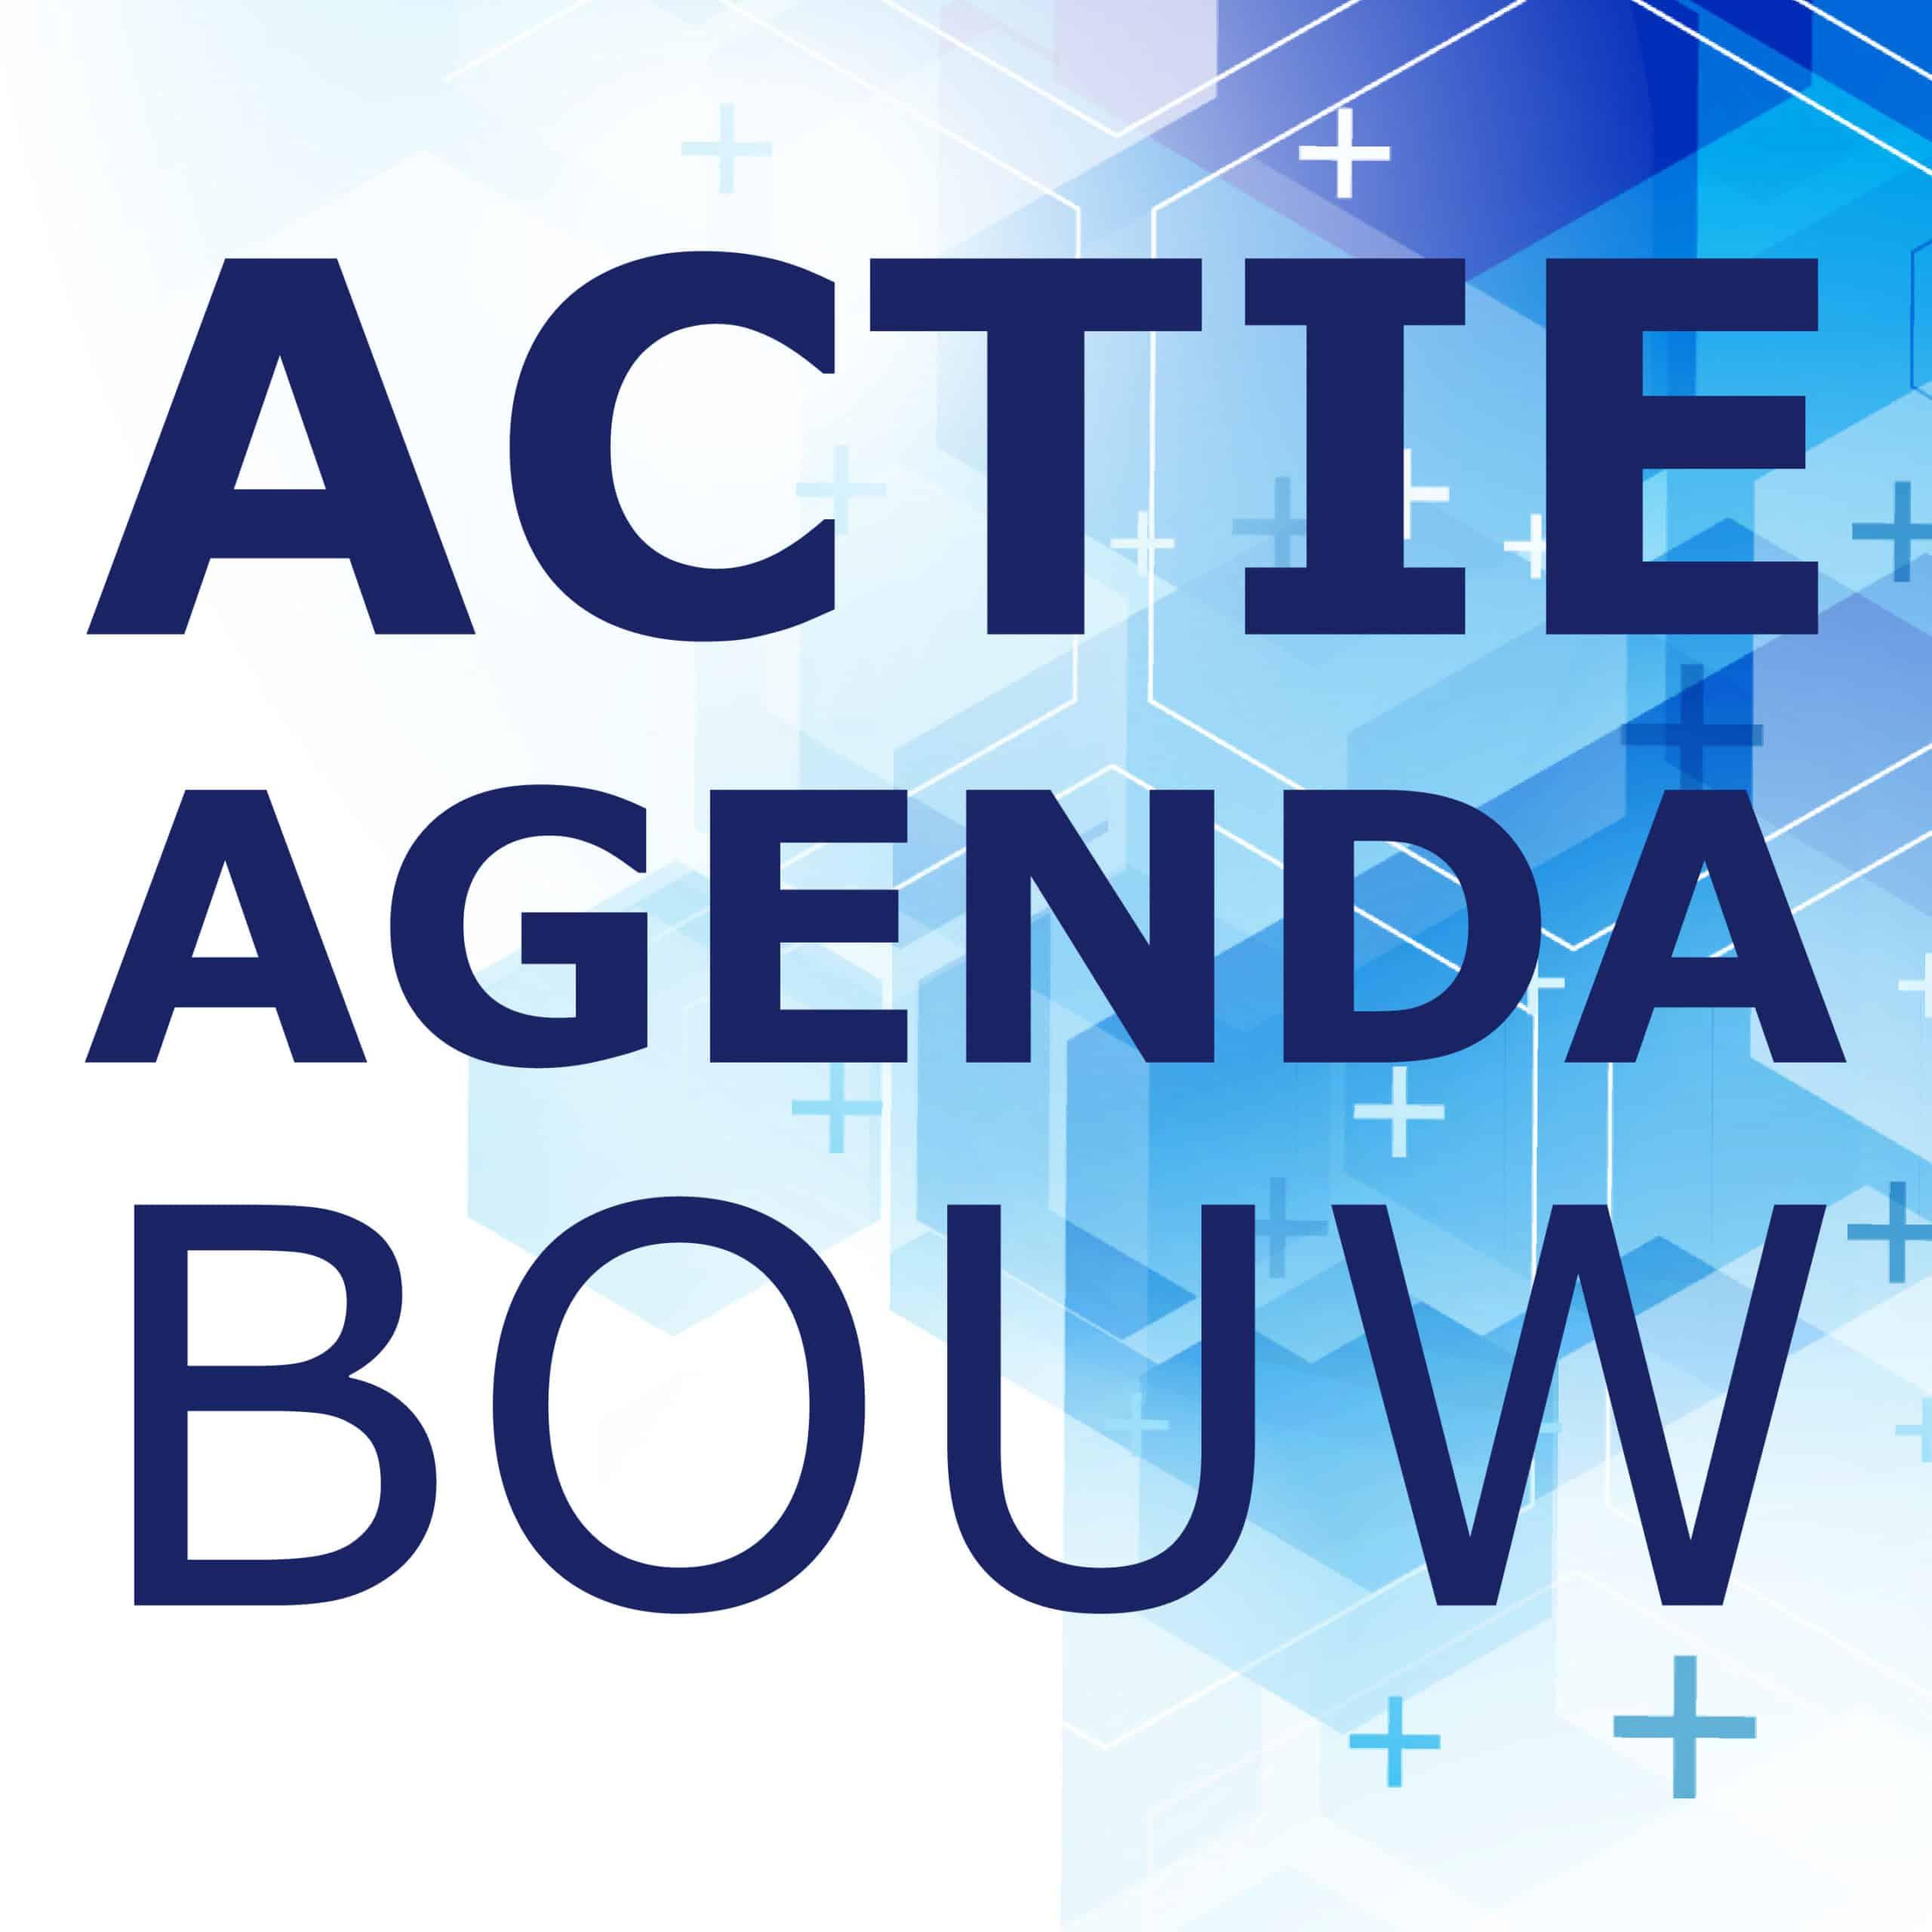 Actieagenda-Bouw-logo-4-scaled